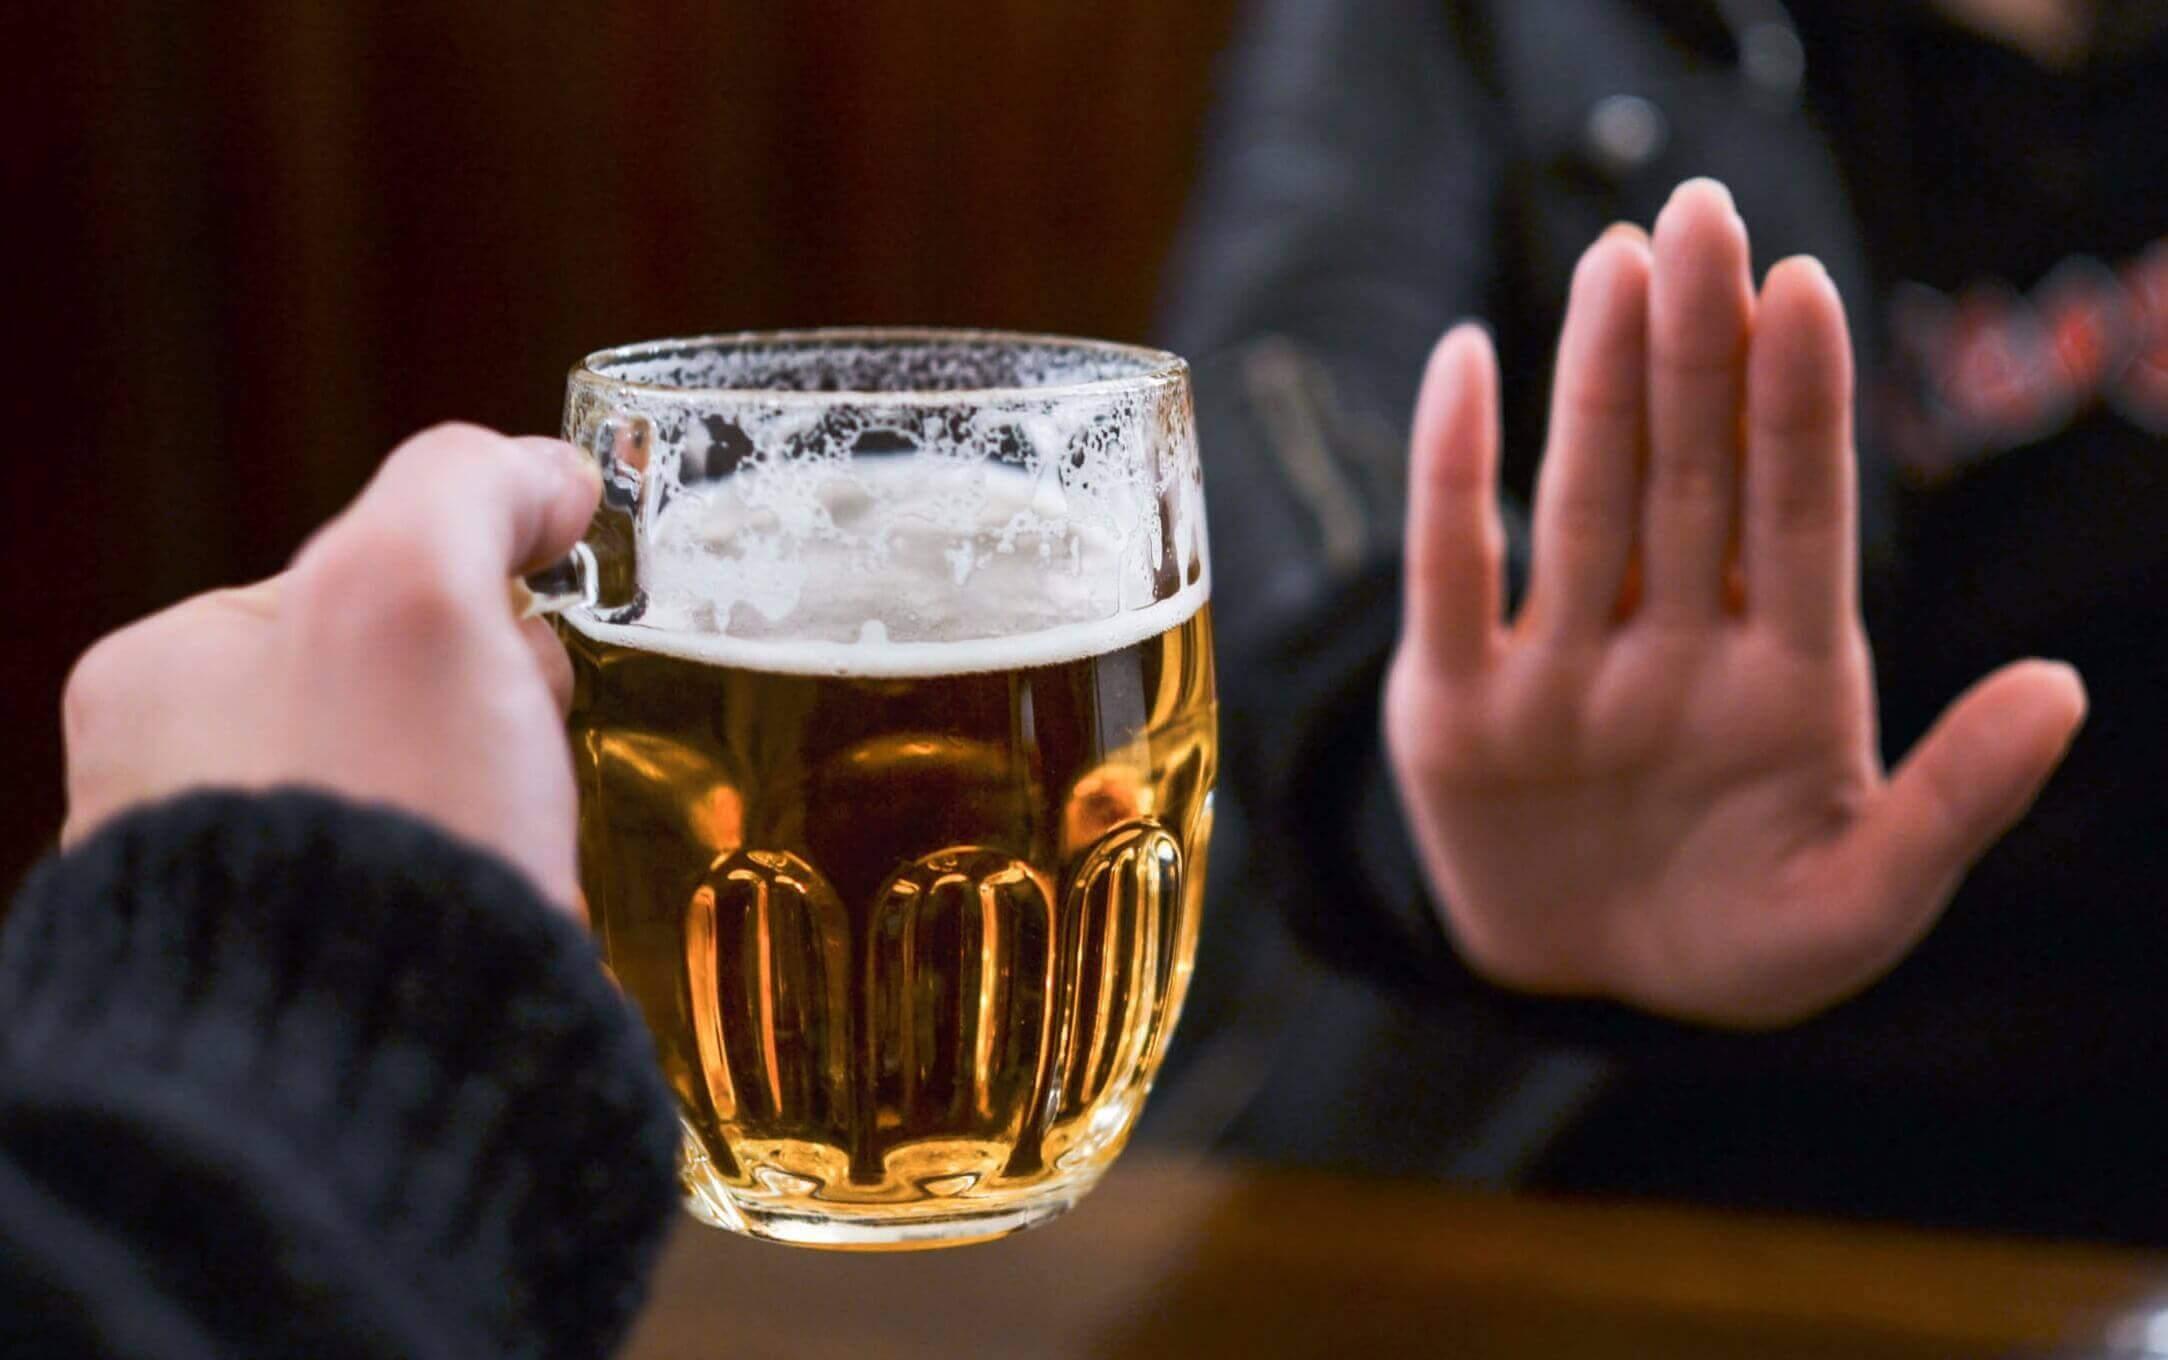 Undgå alkohol under leverdetox